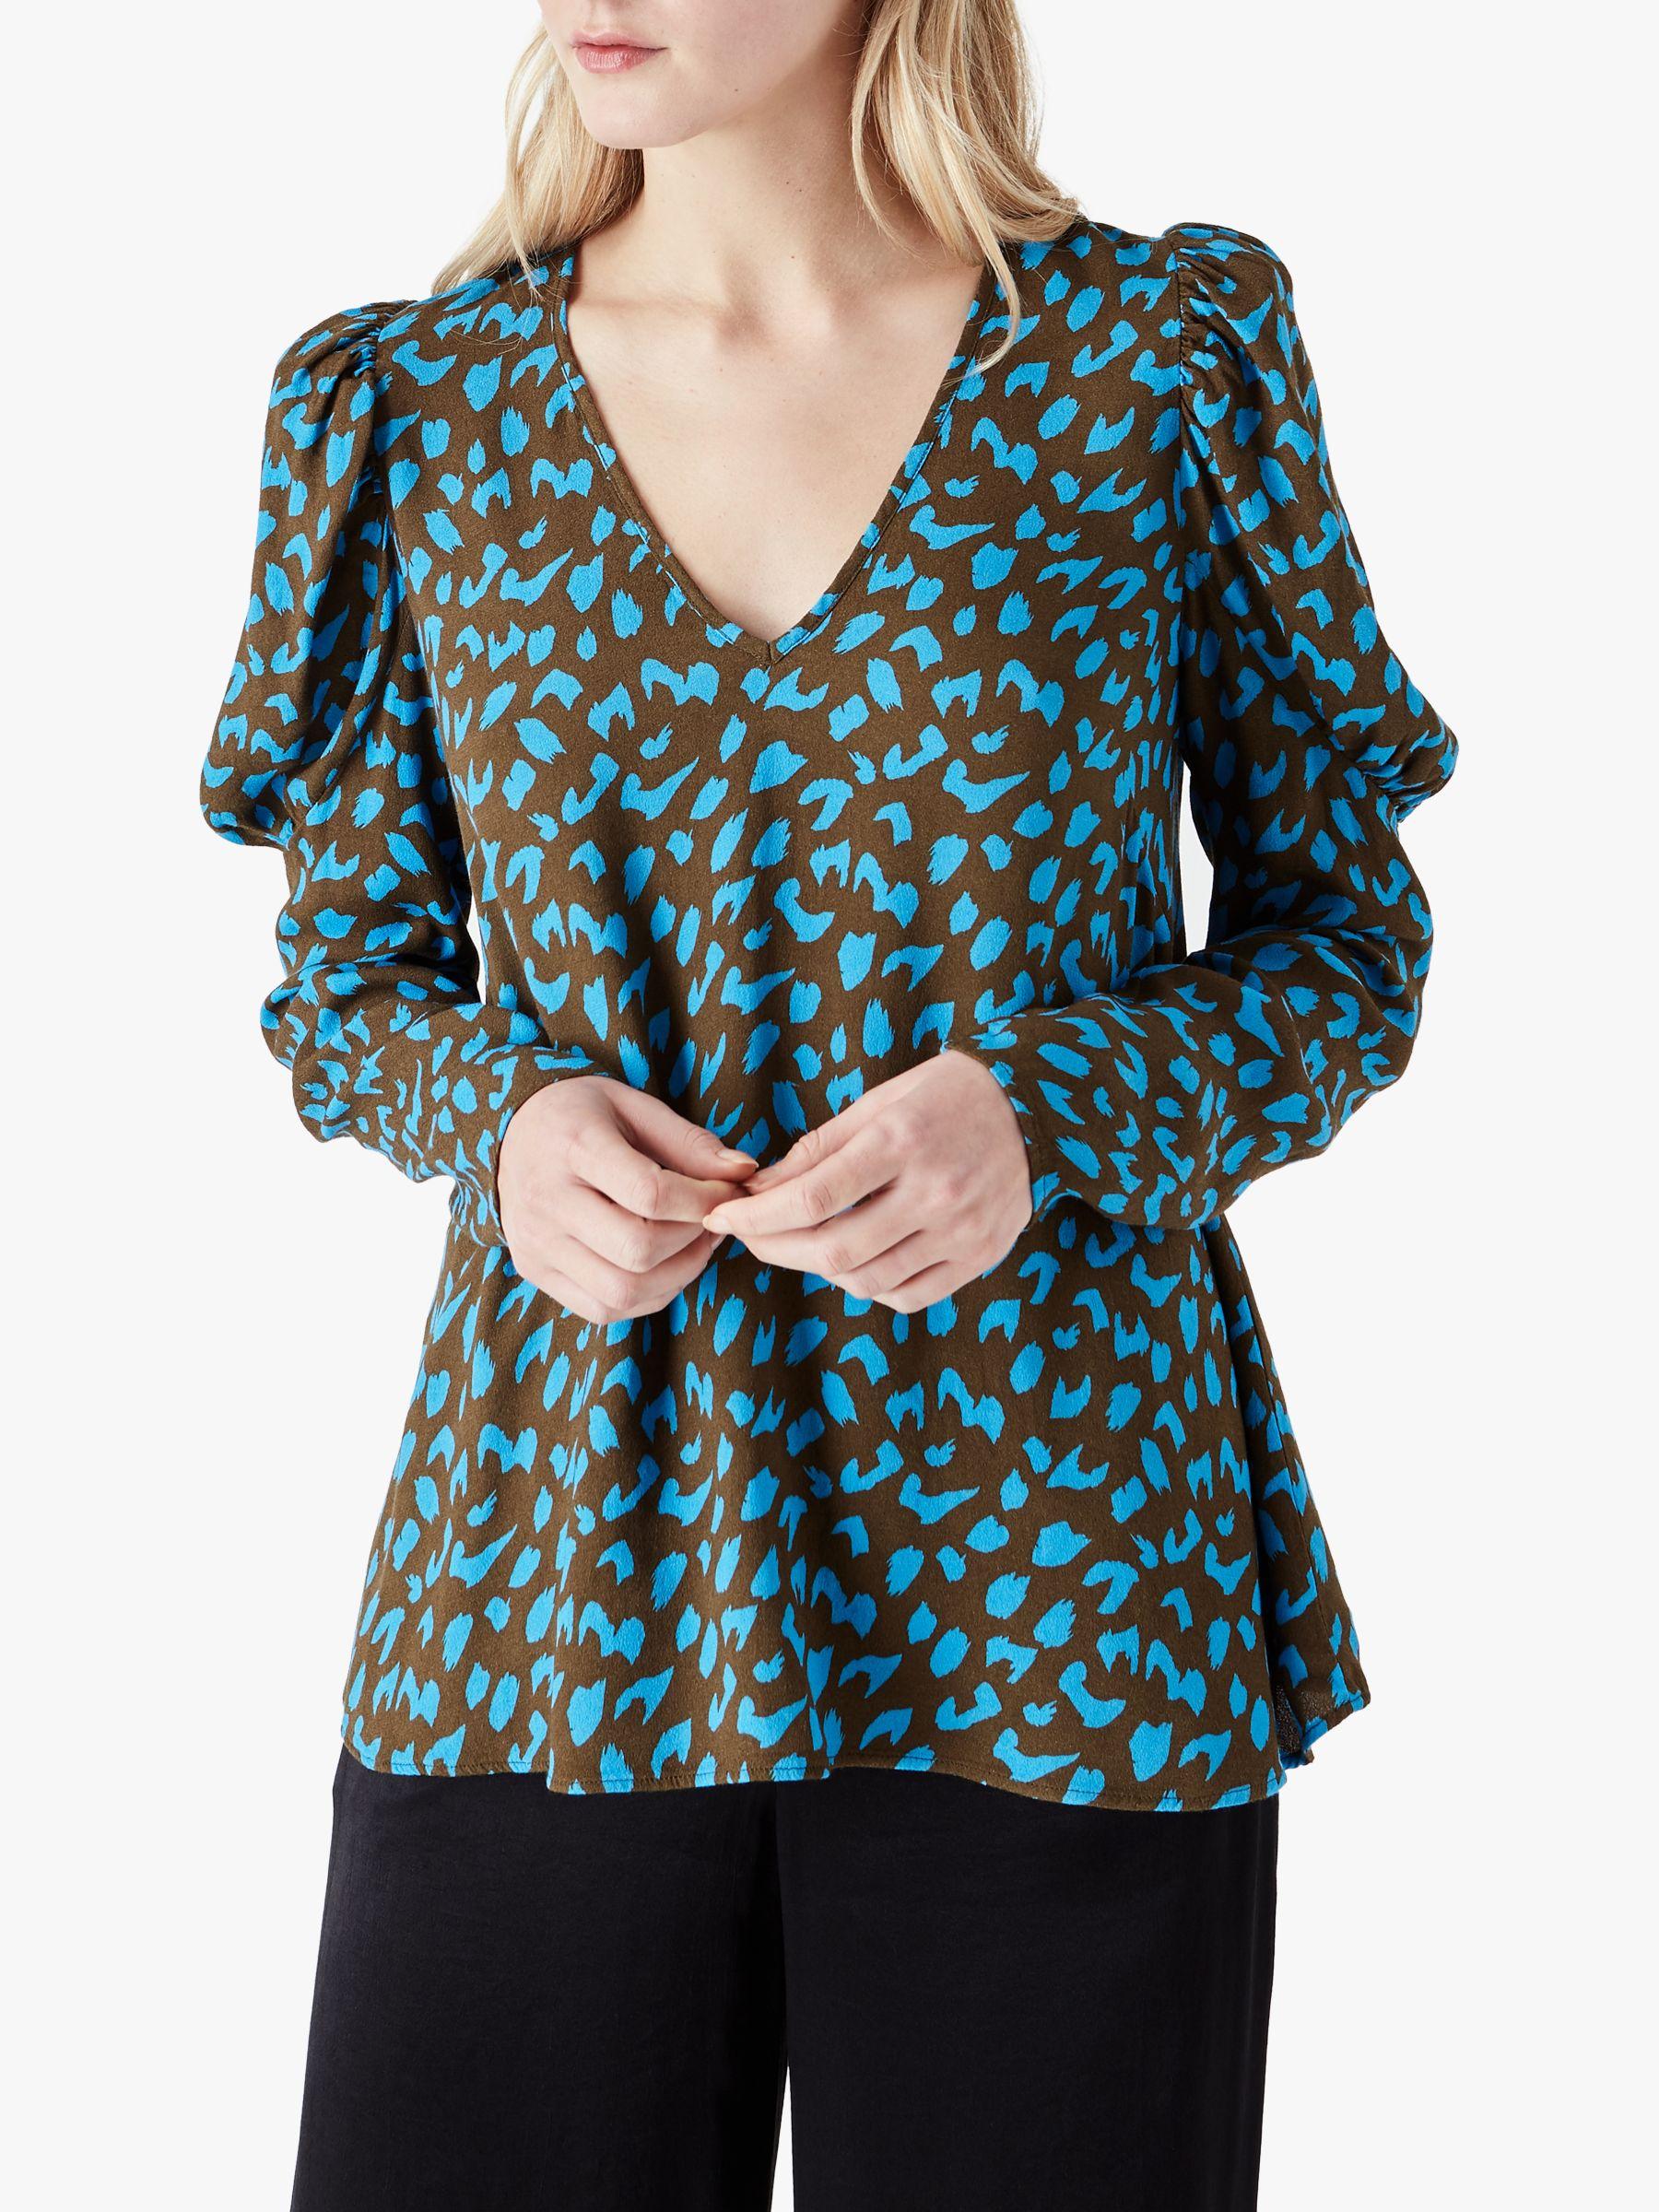 Finery Finery Lena Leopard Print Top, Multi